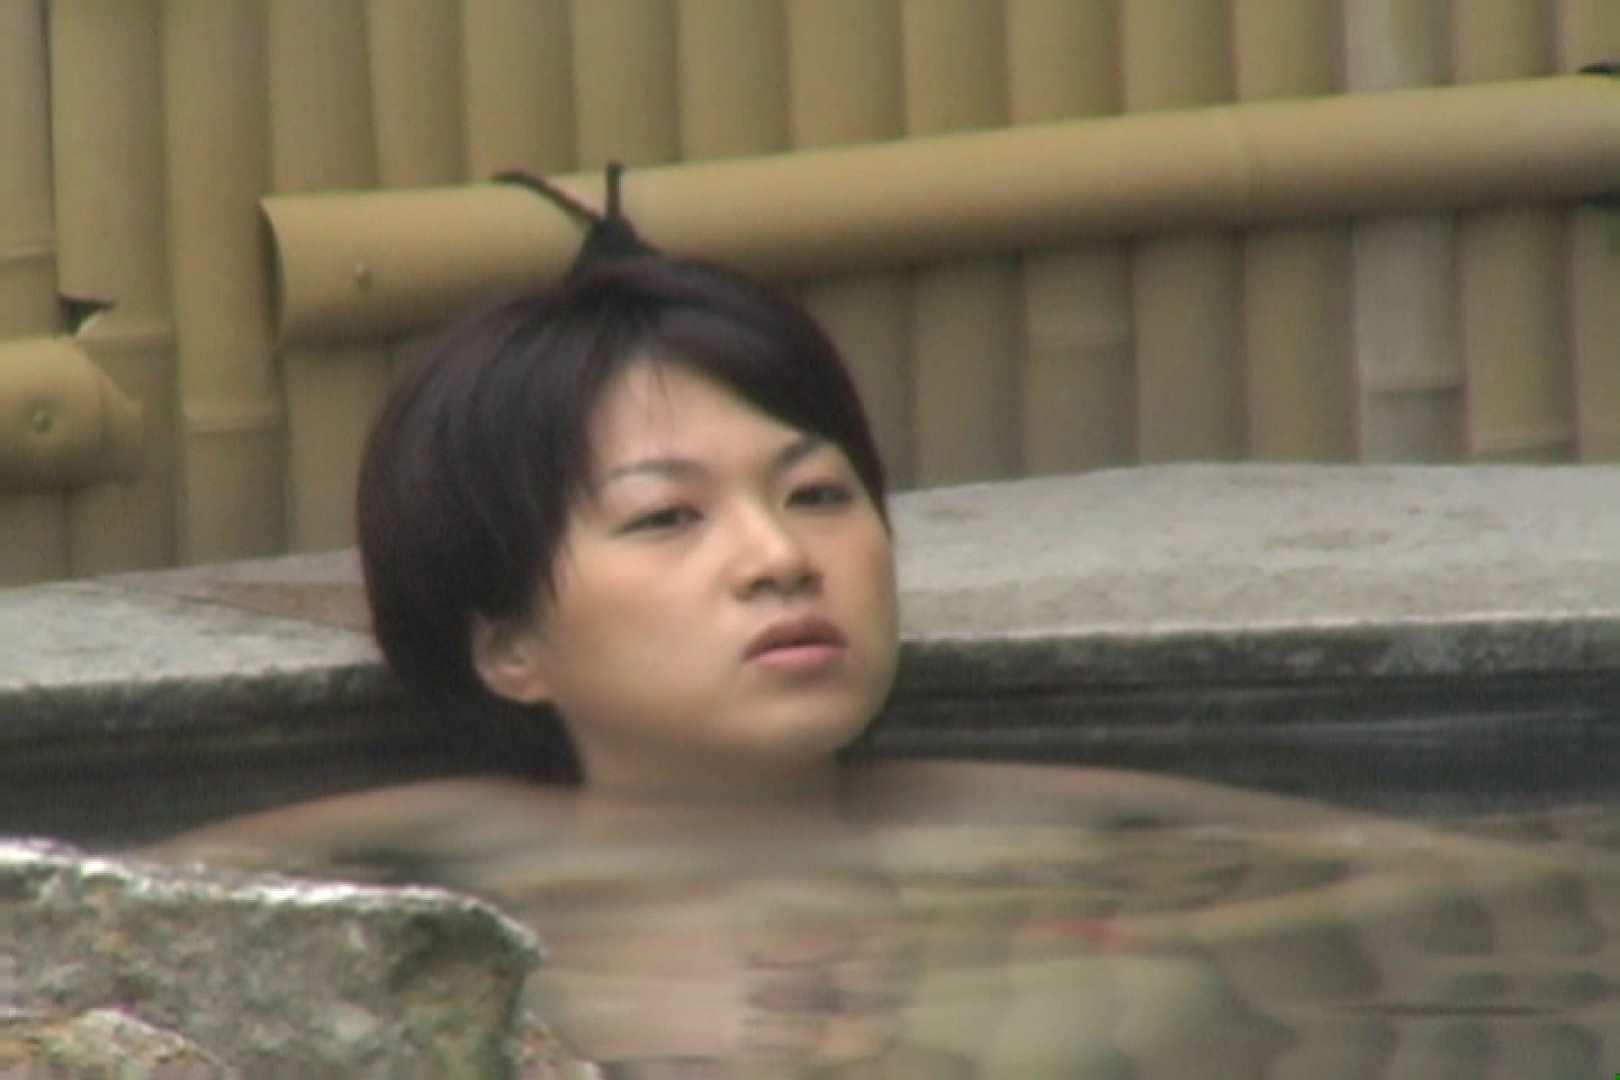 Aquaな露天風呂Vol.624 露天風呂編  88PIX 28